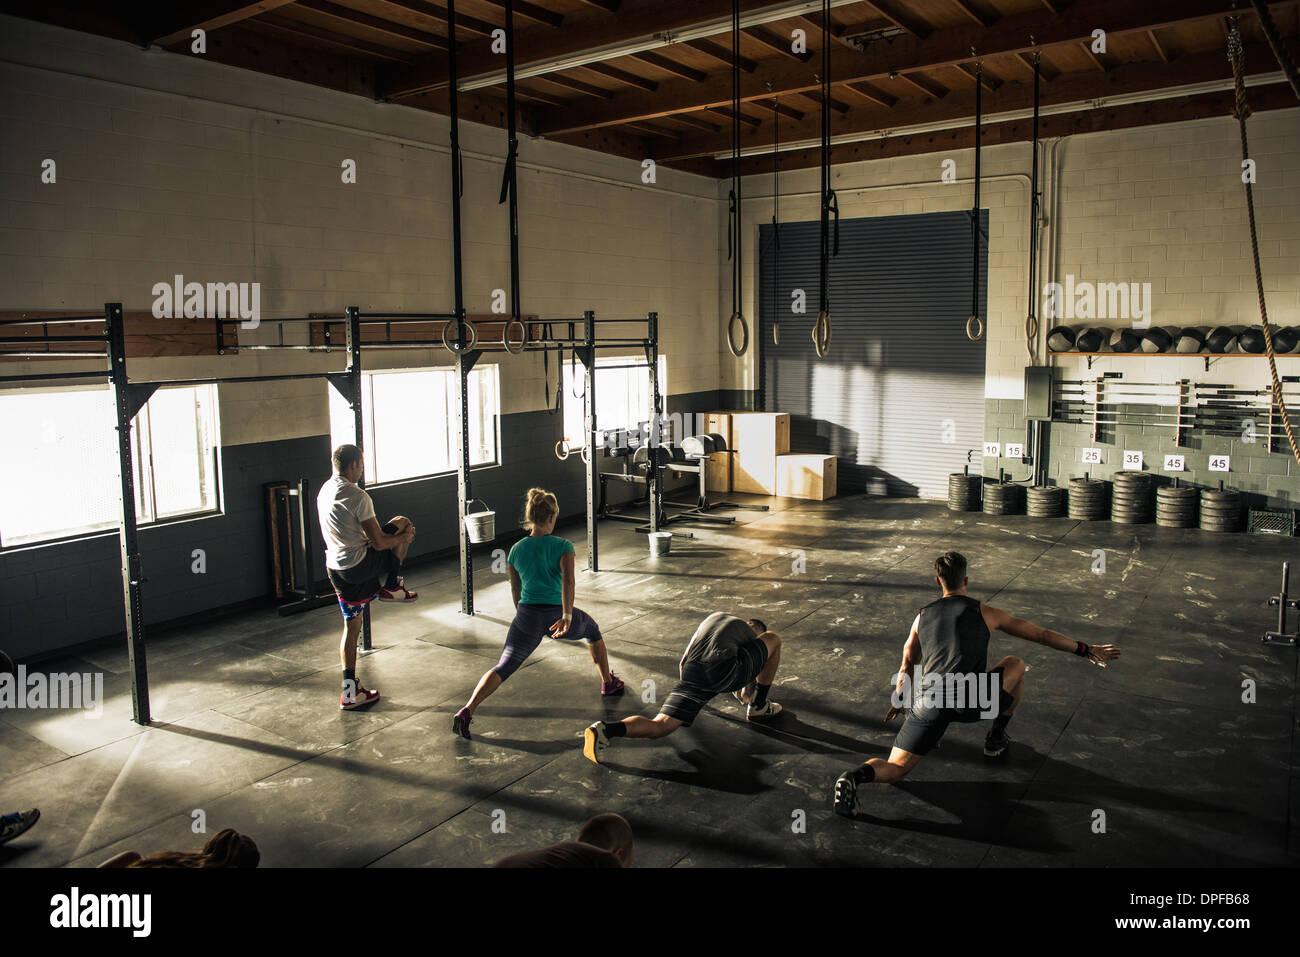 Zusammen Aufwärmen im Fitness-Studio Fitness-Klasse Stockbild